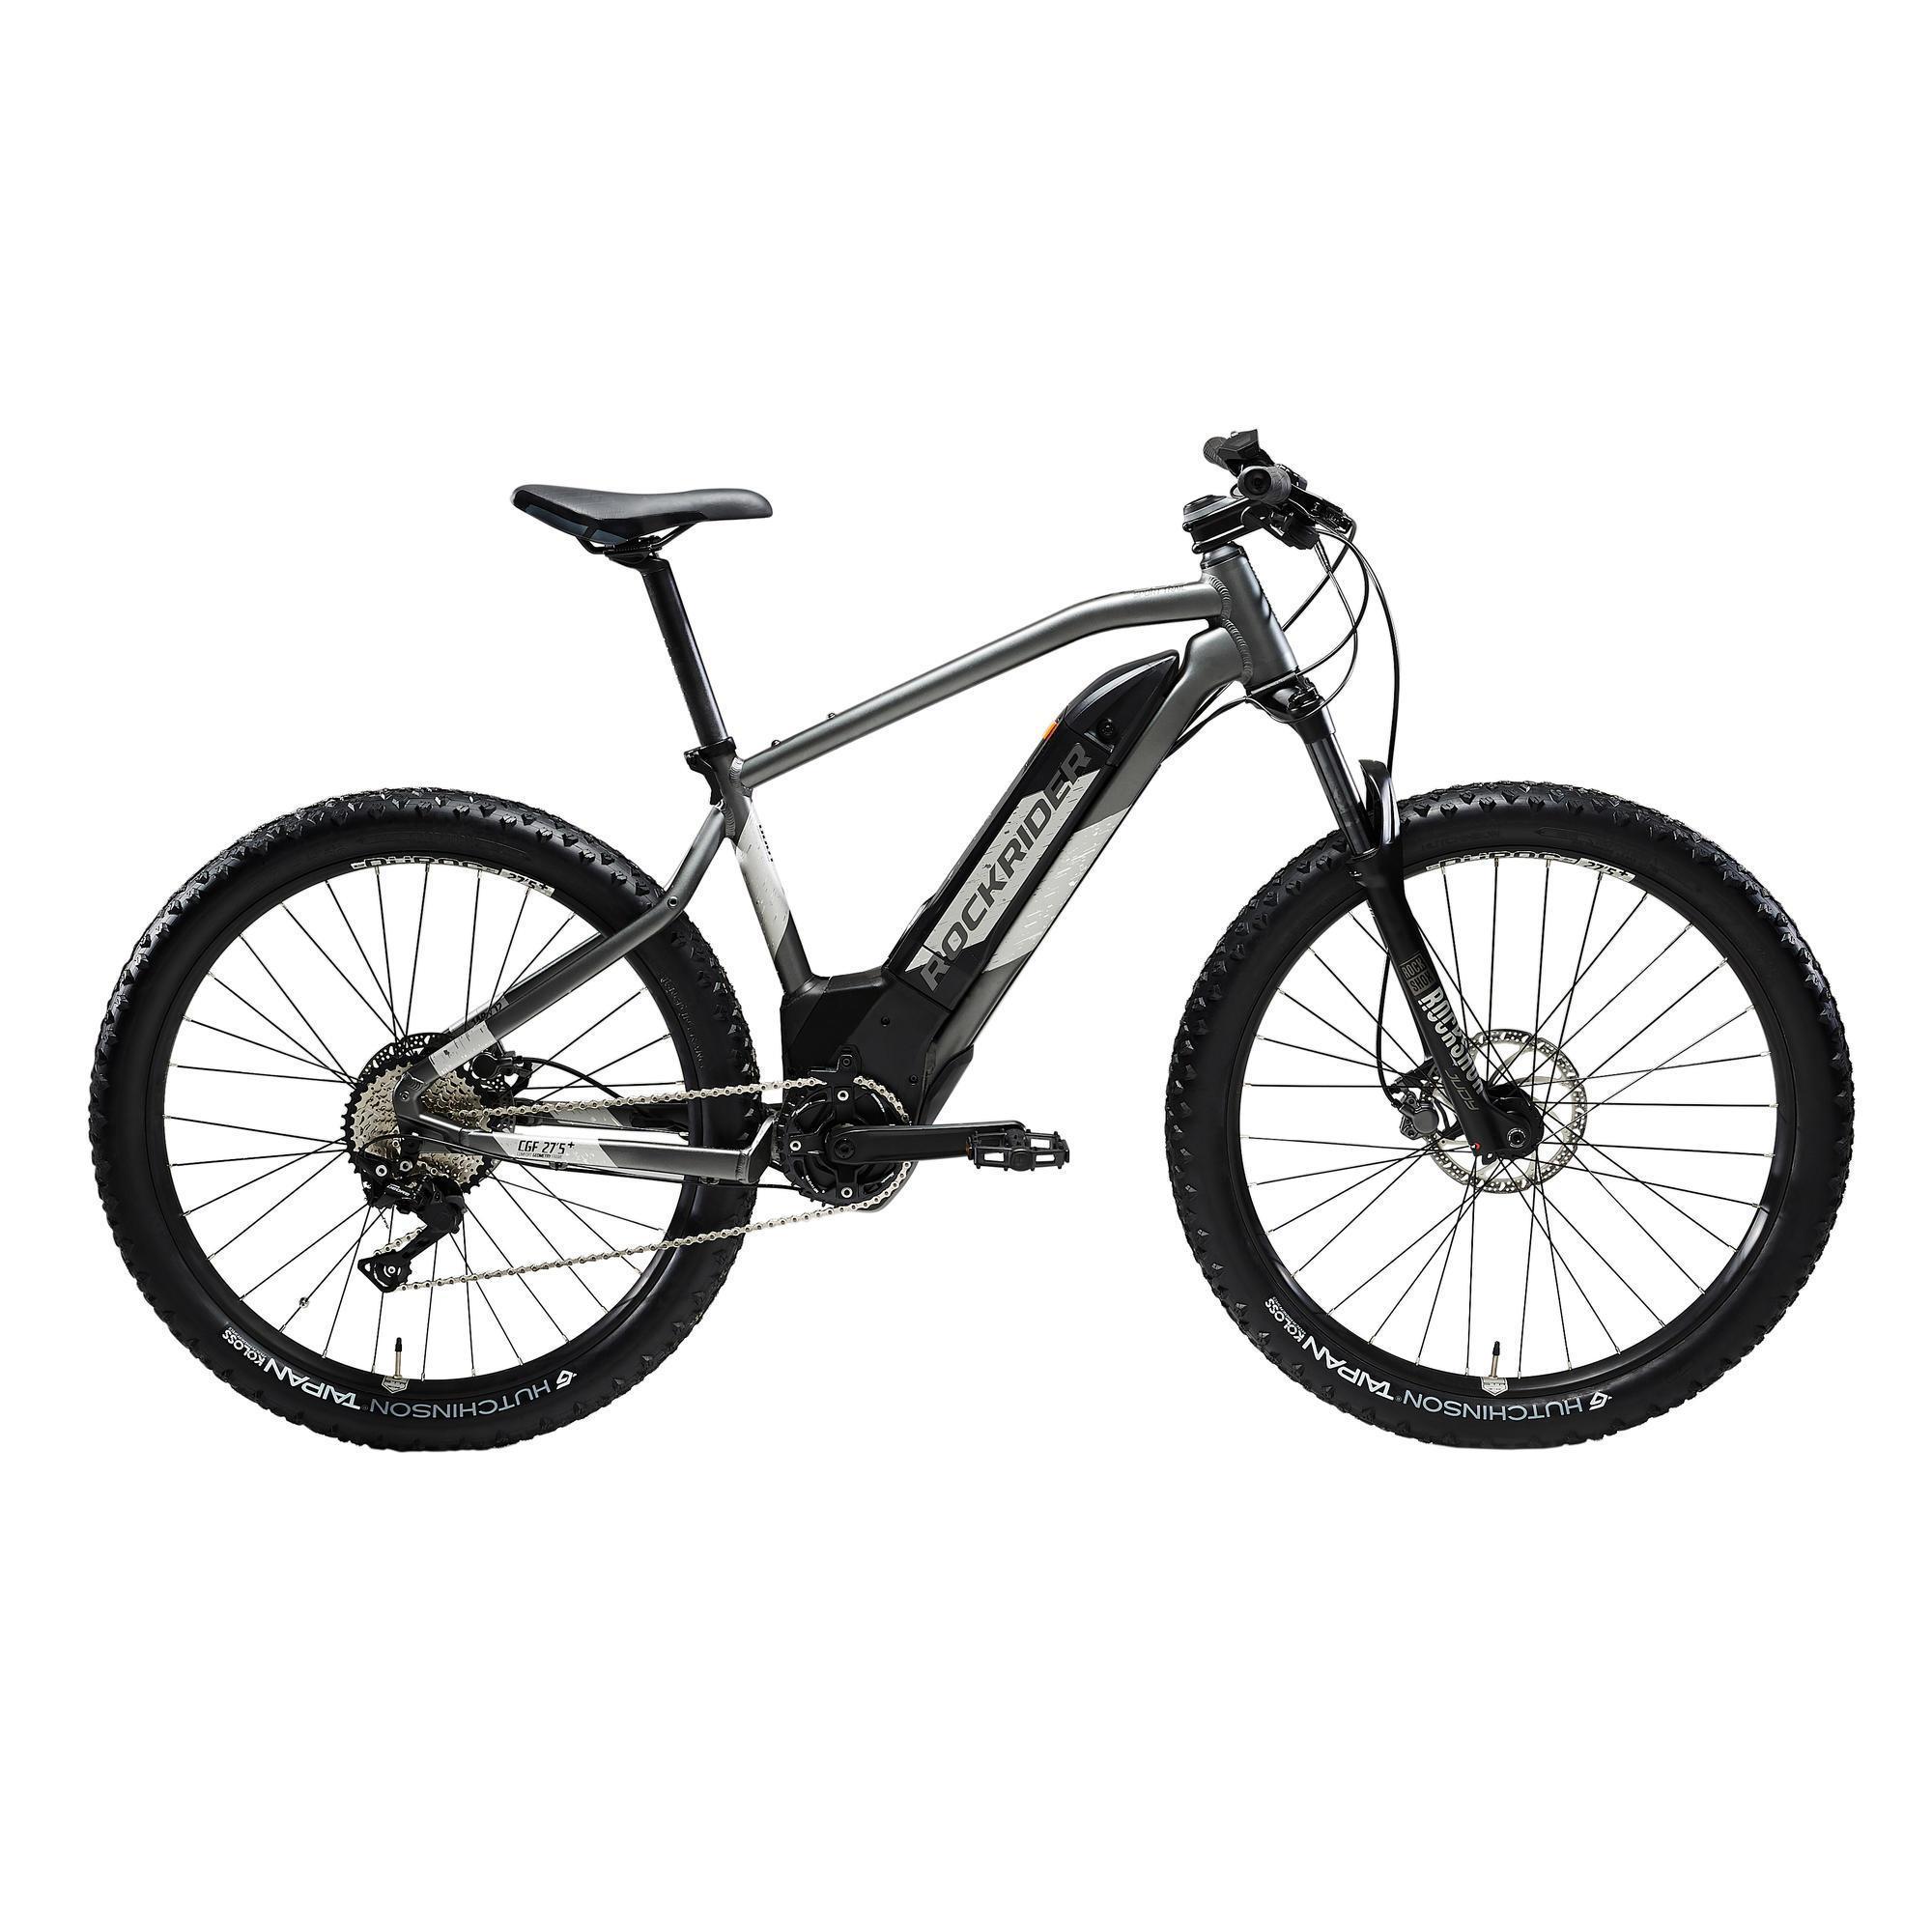 Bicicleta eléctrica de montaña Rockrider EBIKE ST 900